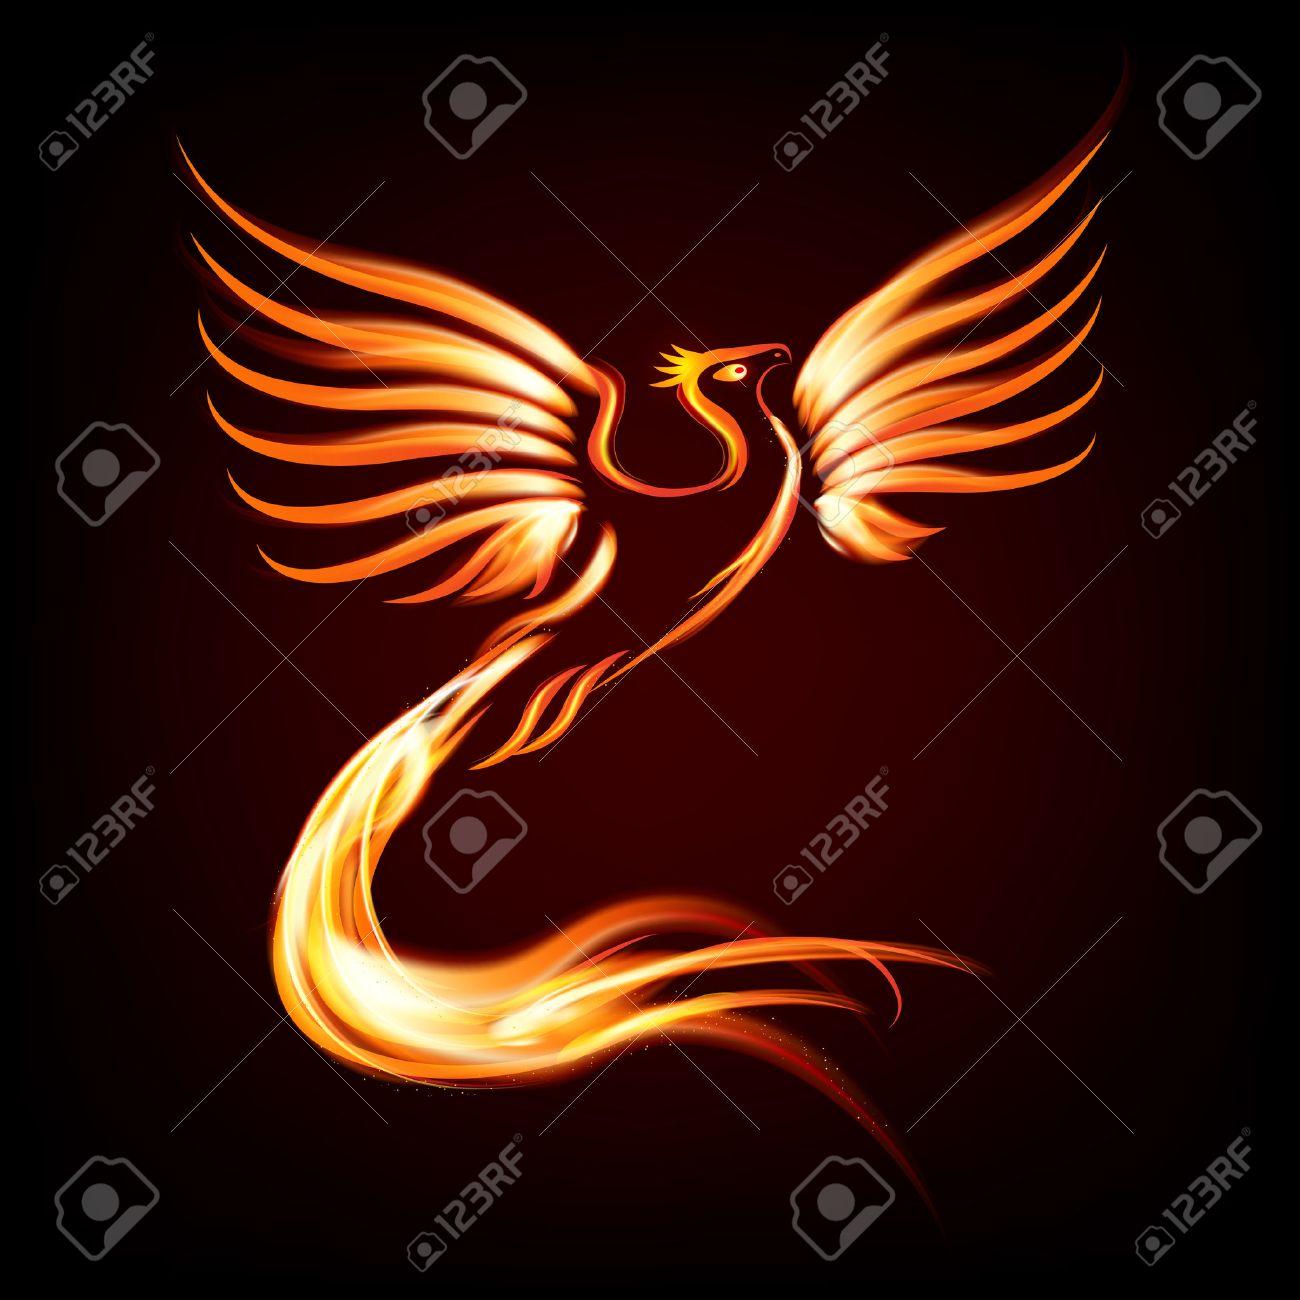 phoenix bird fire silhouette vector illustration royalty free